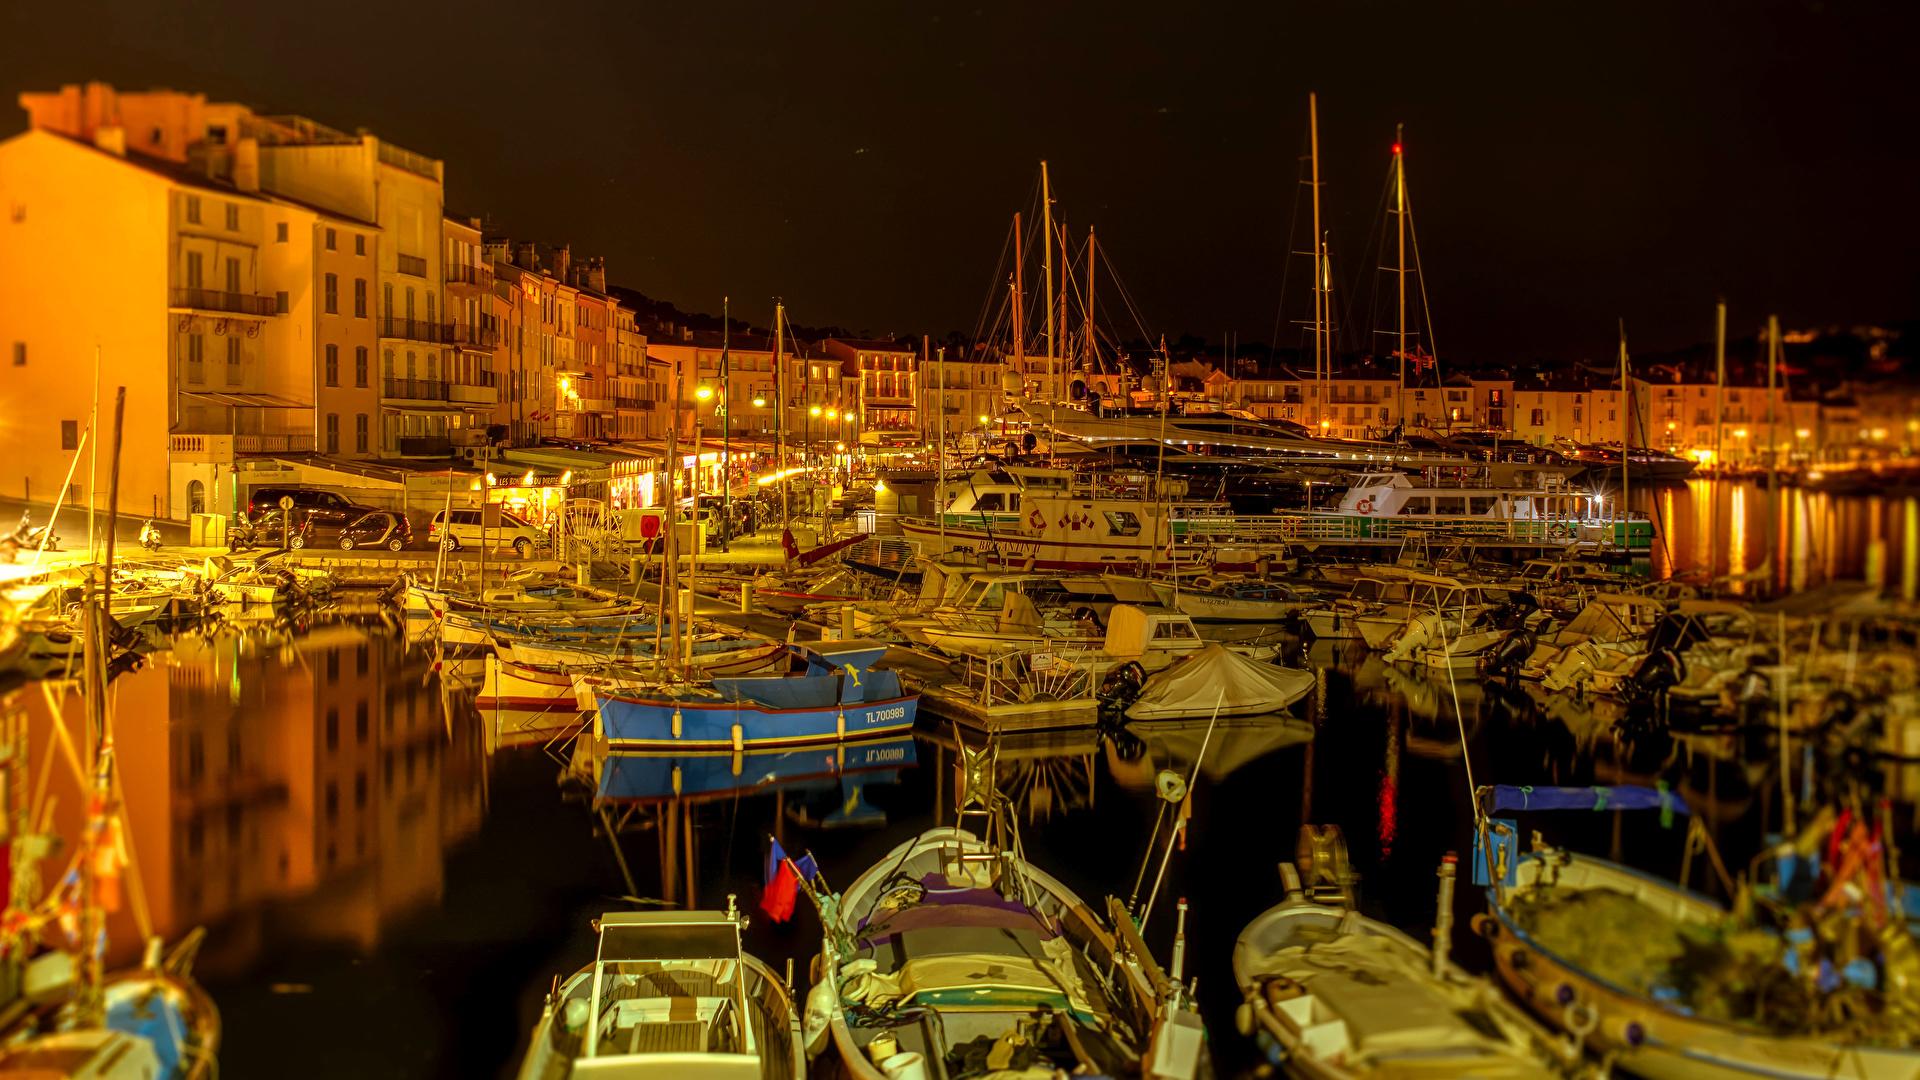 Wallpapers France Saint Tropez Pier Sailing night time 1920x1080 1920x1080